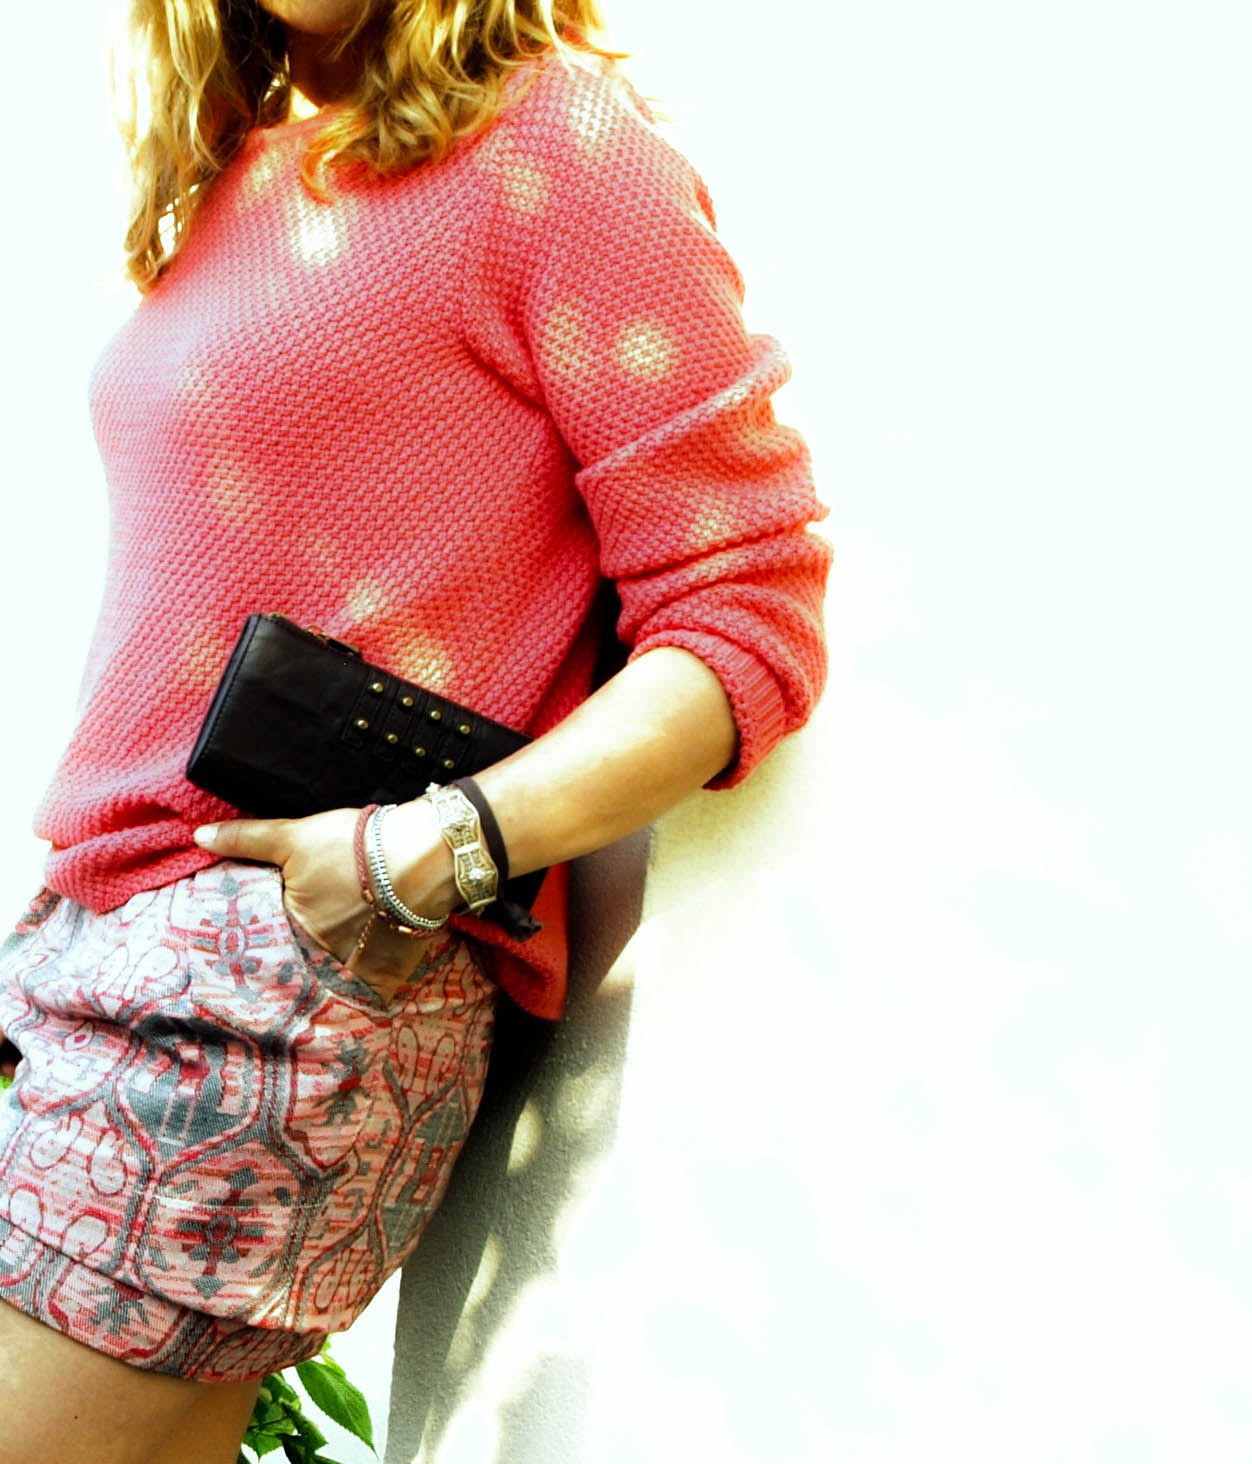 Boden Stitch Sweater, Maje skirt, Ferragamo Varina, Pink sweater,